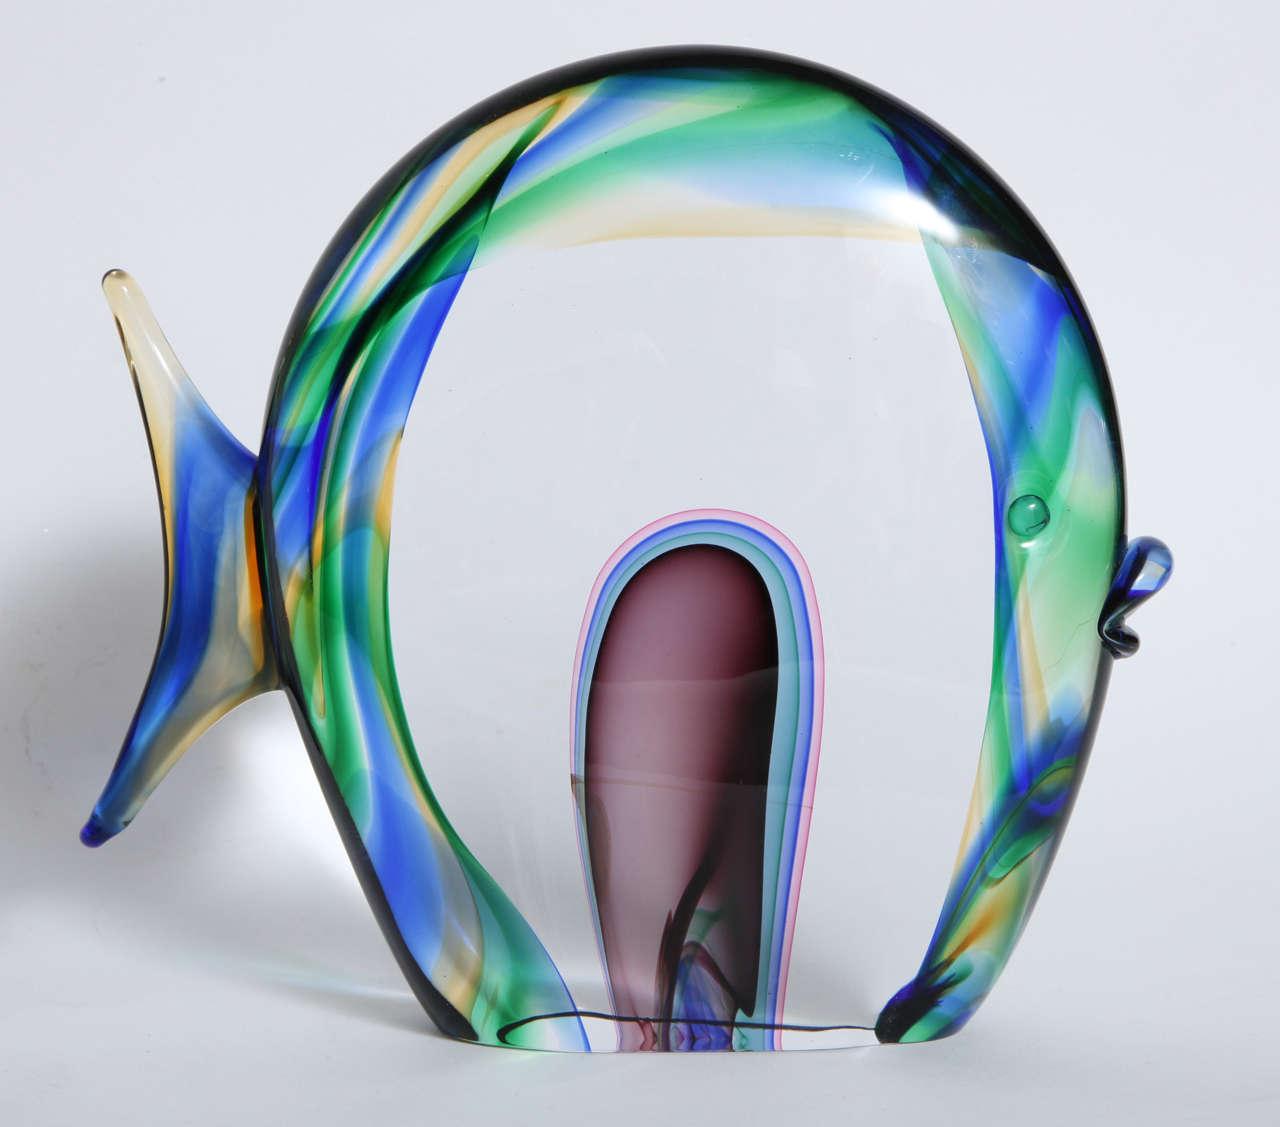 Murano glass fish signed luigi mellara for sale at 1stdibs for Murano glass fish